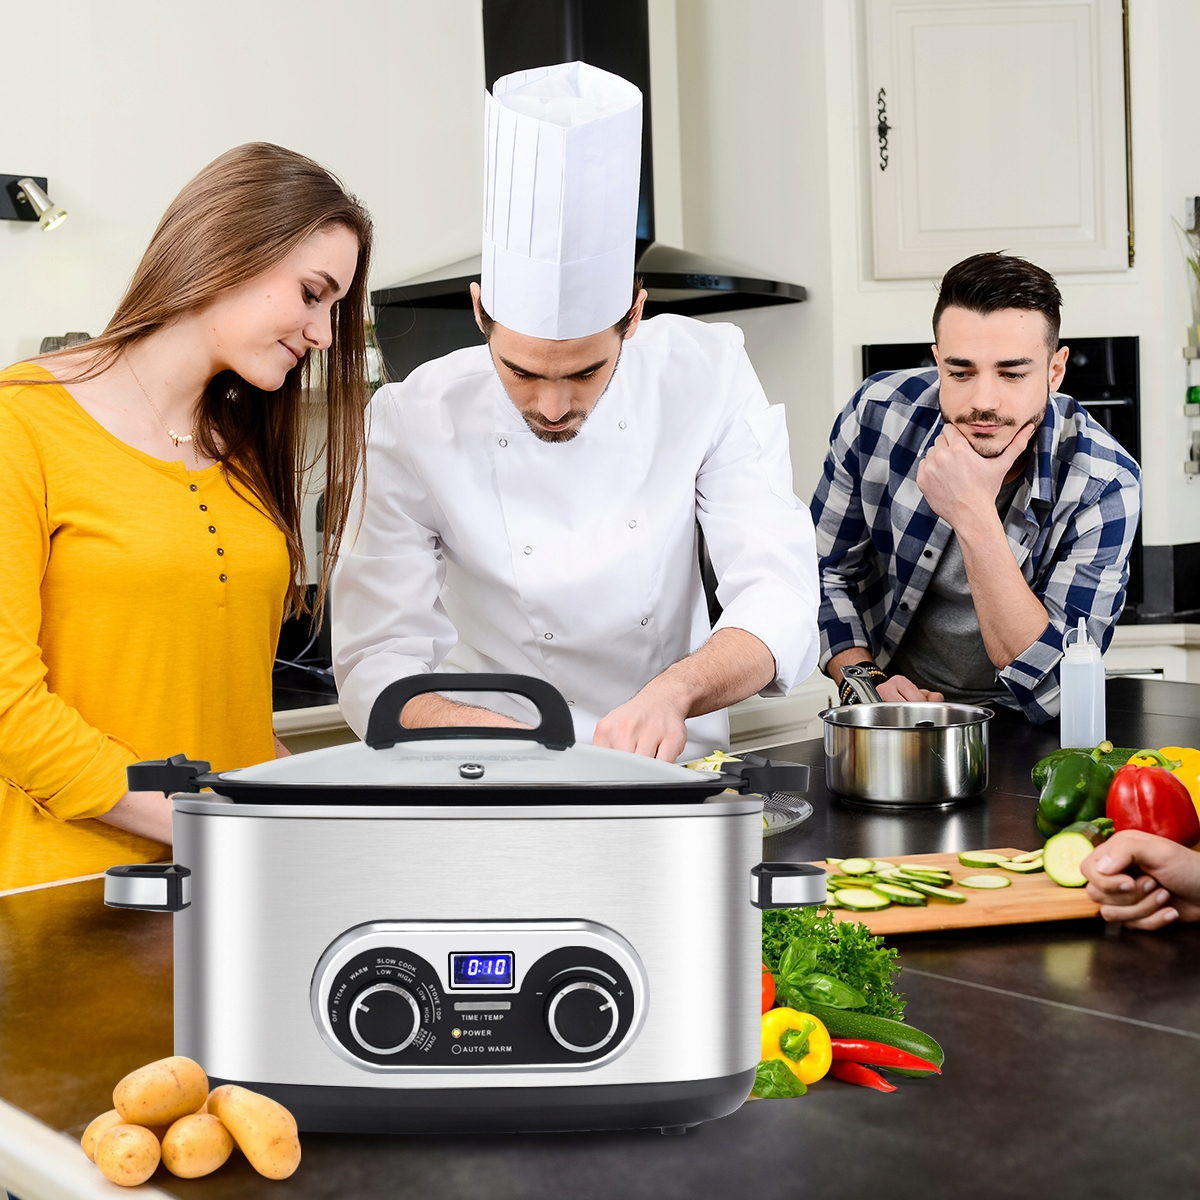 powolna kuchenka wielofunkcyjna, kuchenka cyfrowa